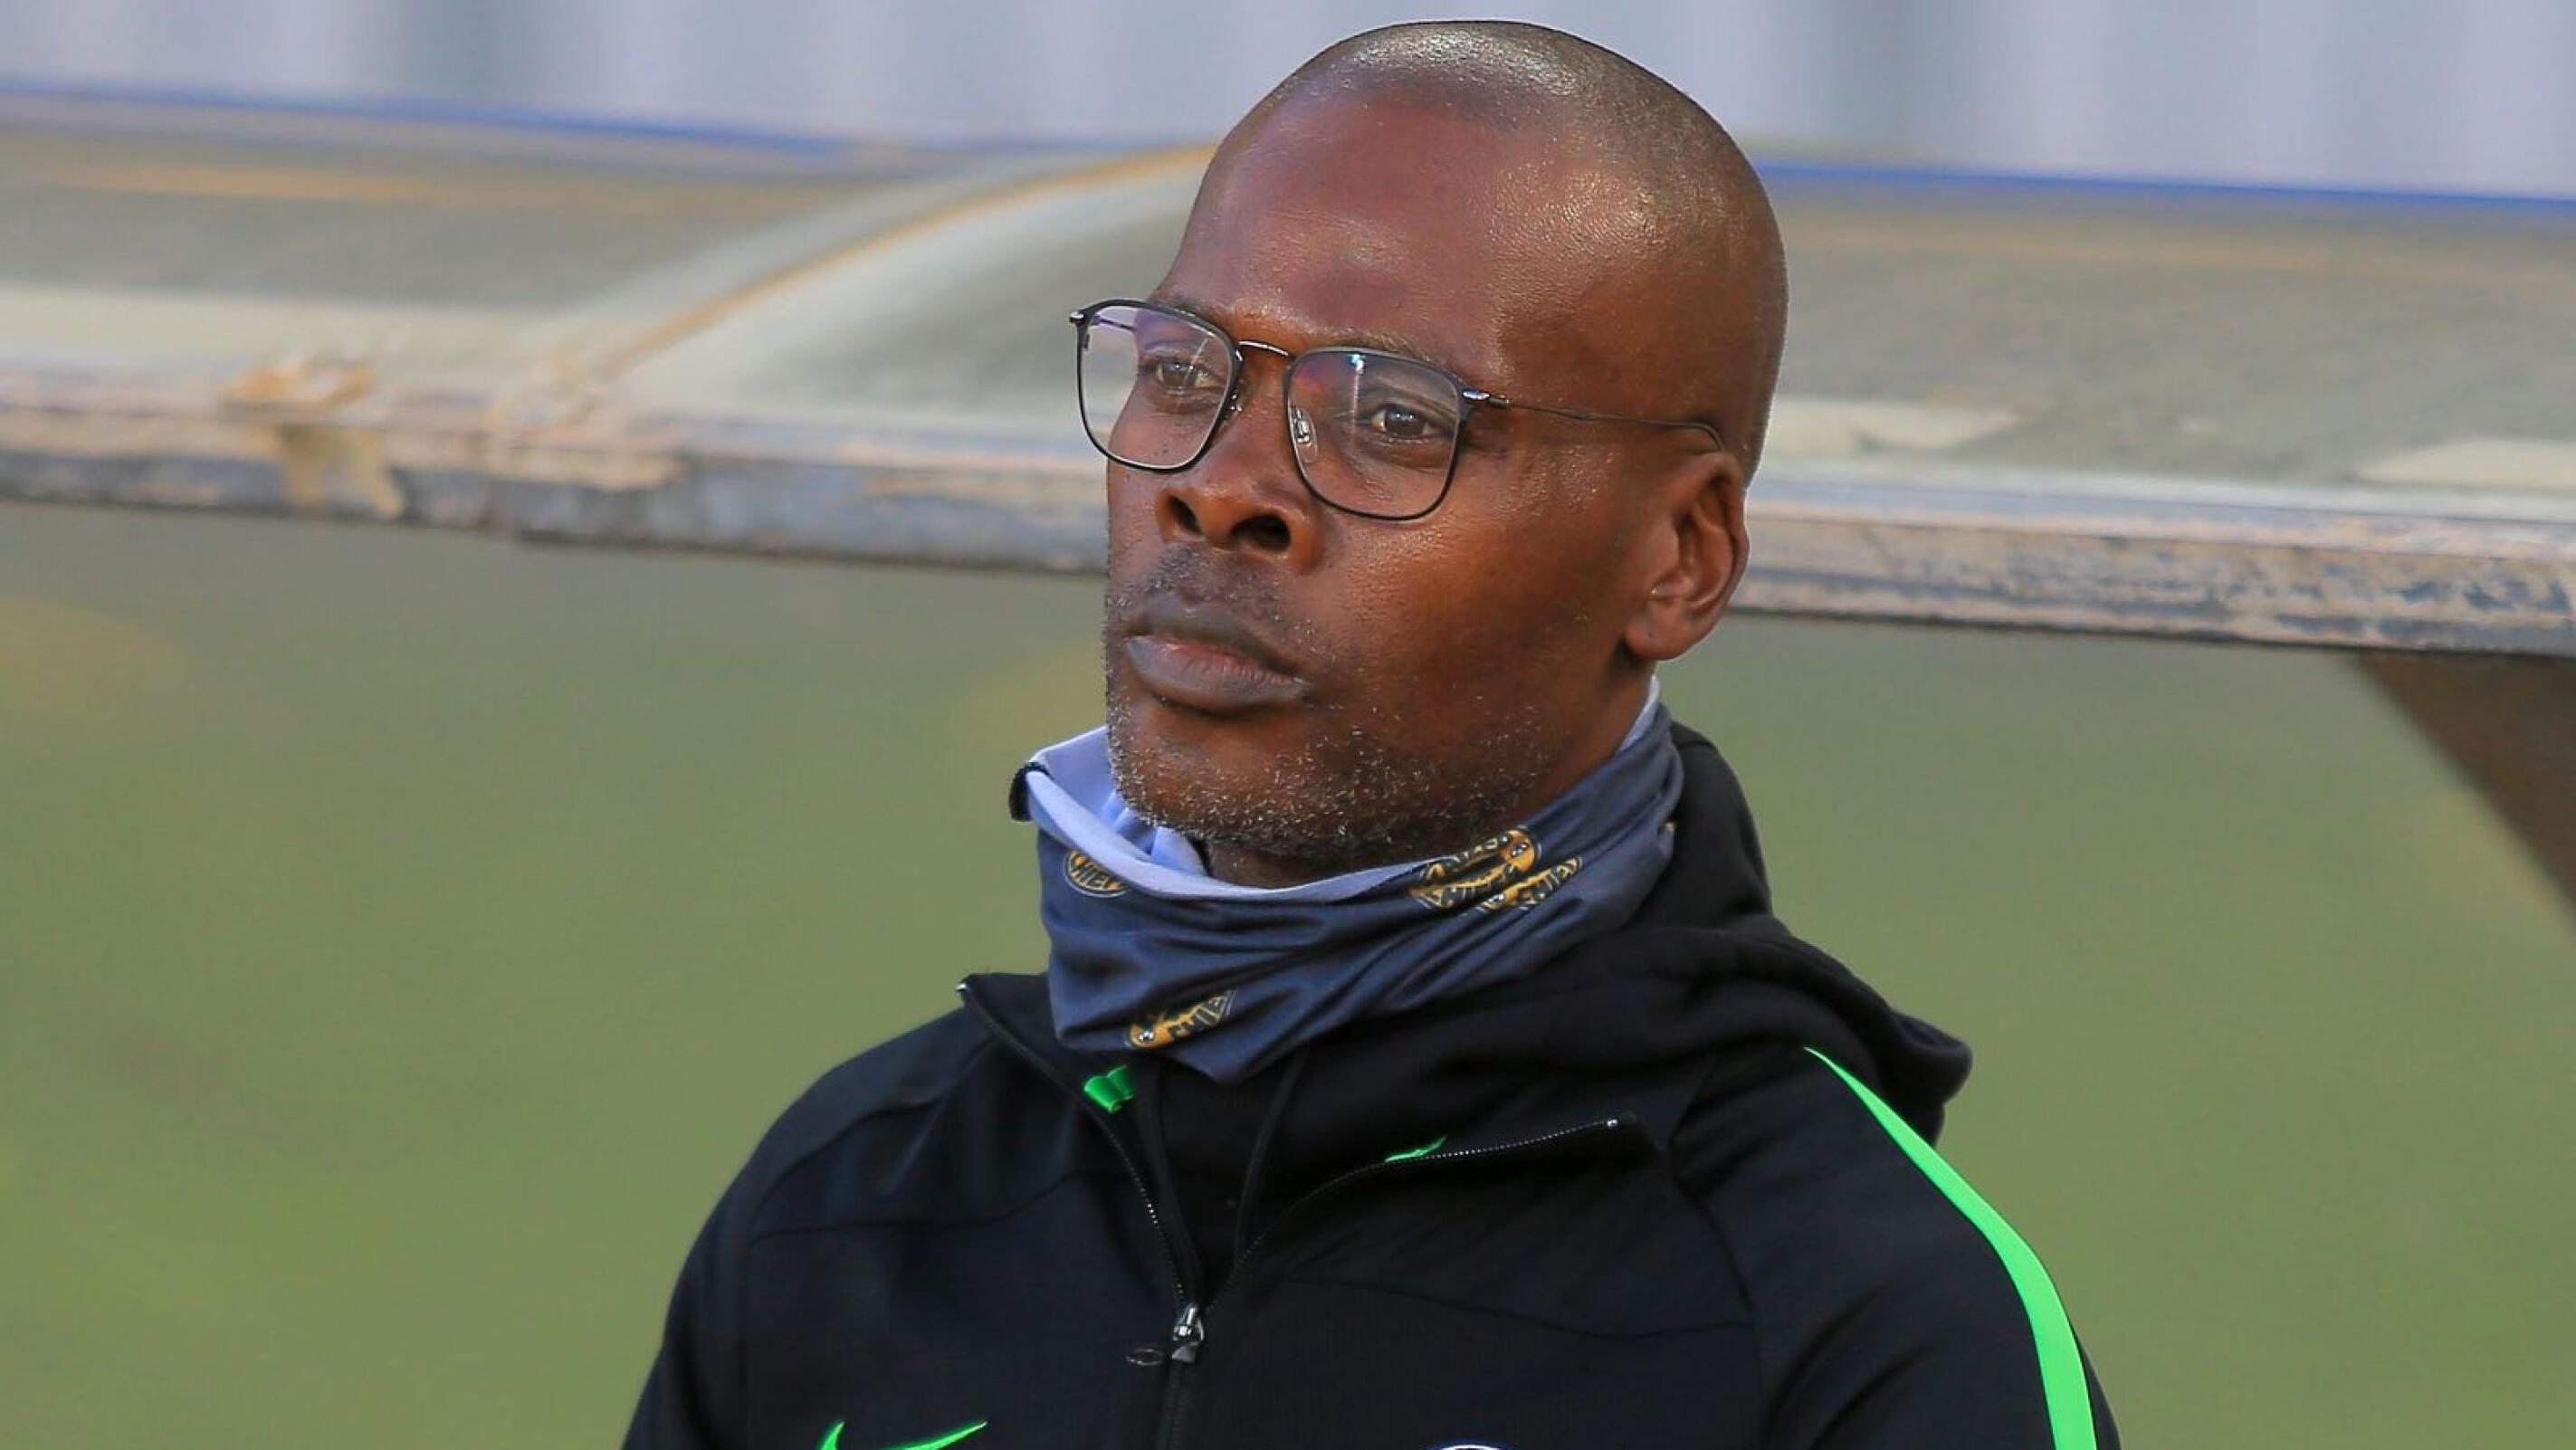 Kaizer Chiefs interim coach Arthur Zwane reacts during their Caf Champions League semi final first leg against Wydad Casablanca at Stade Mohamed V in Casablanca on Saturday